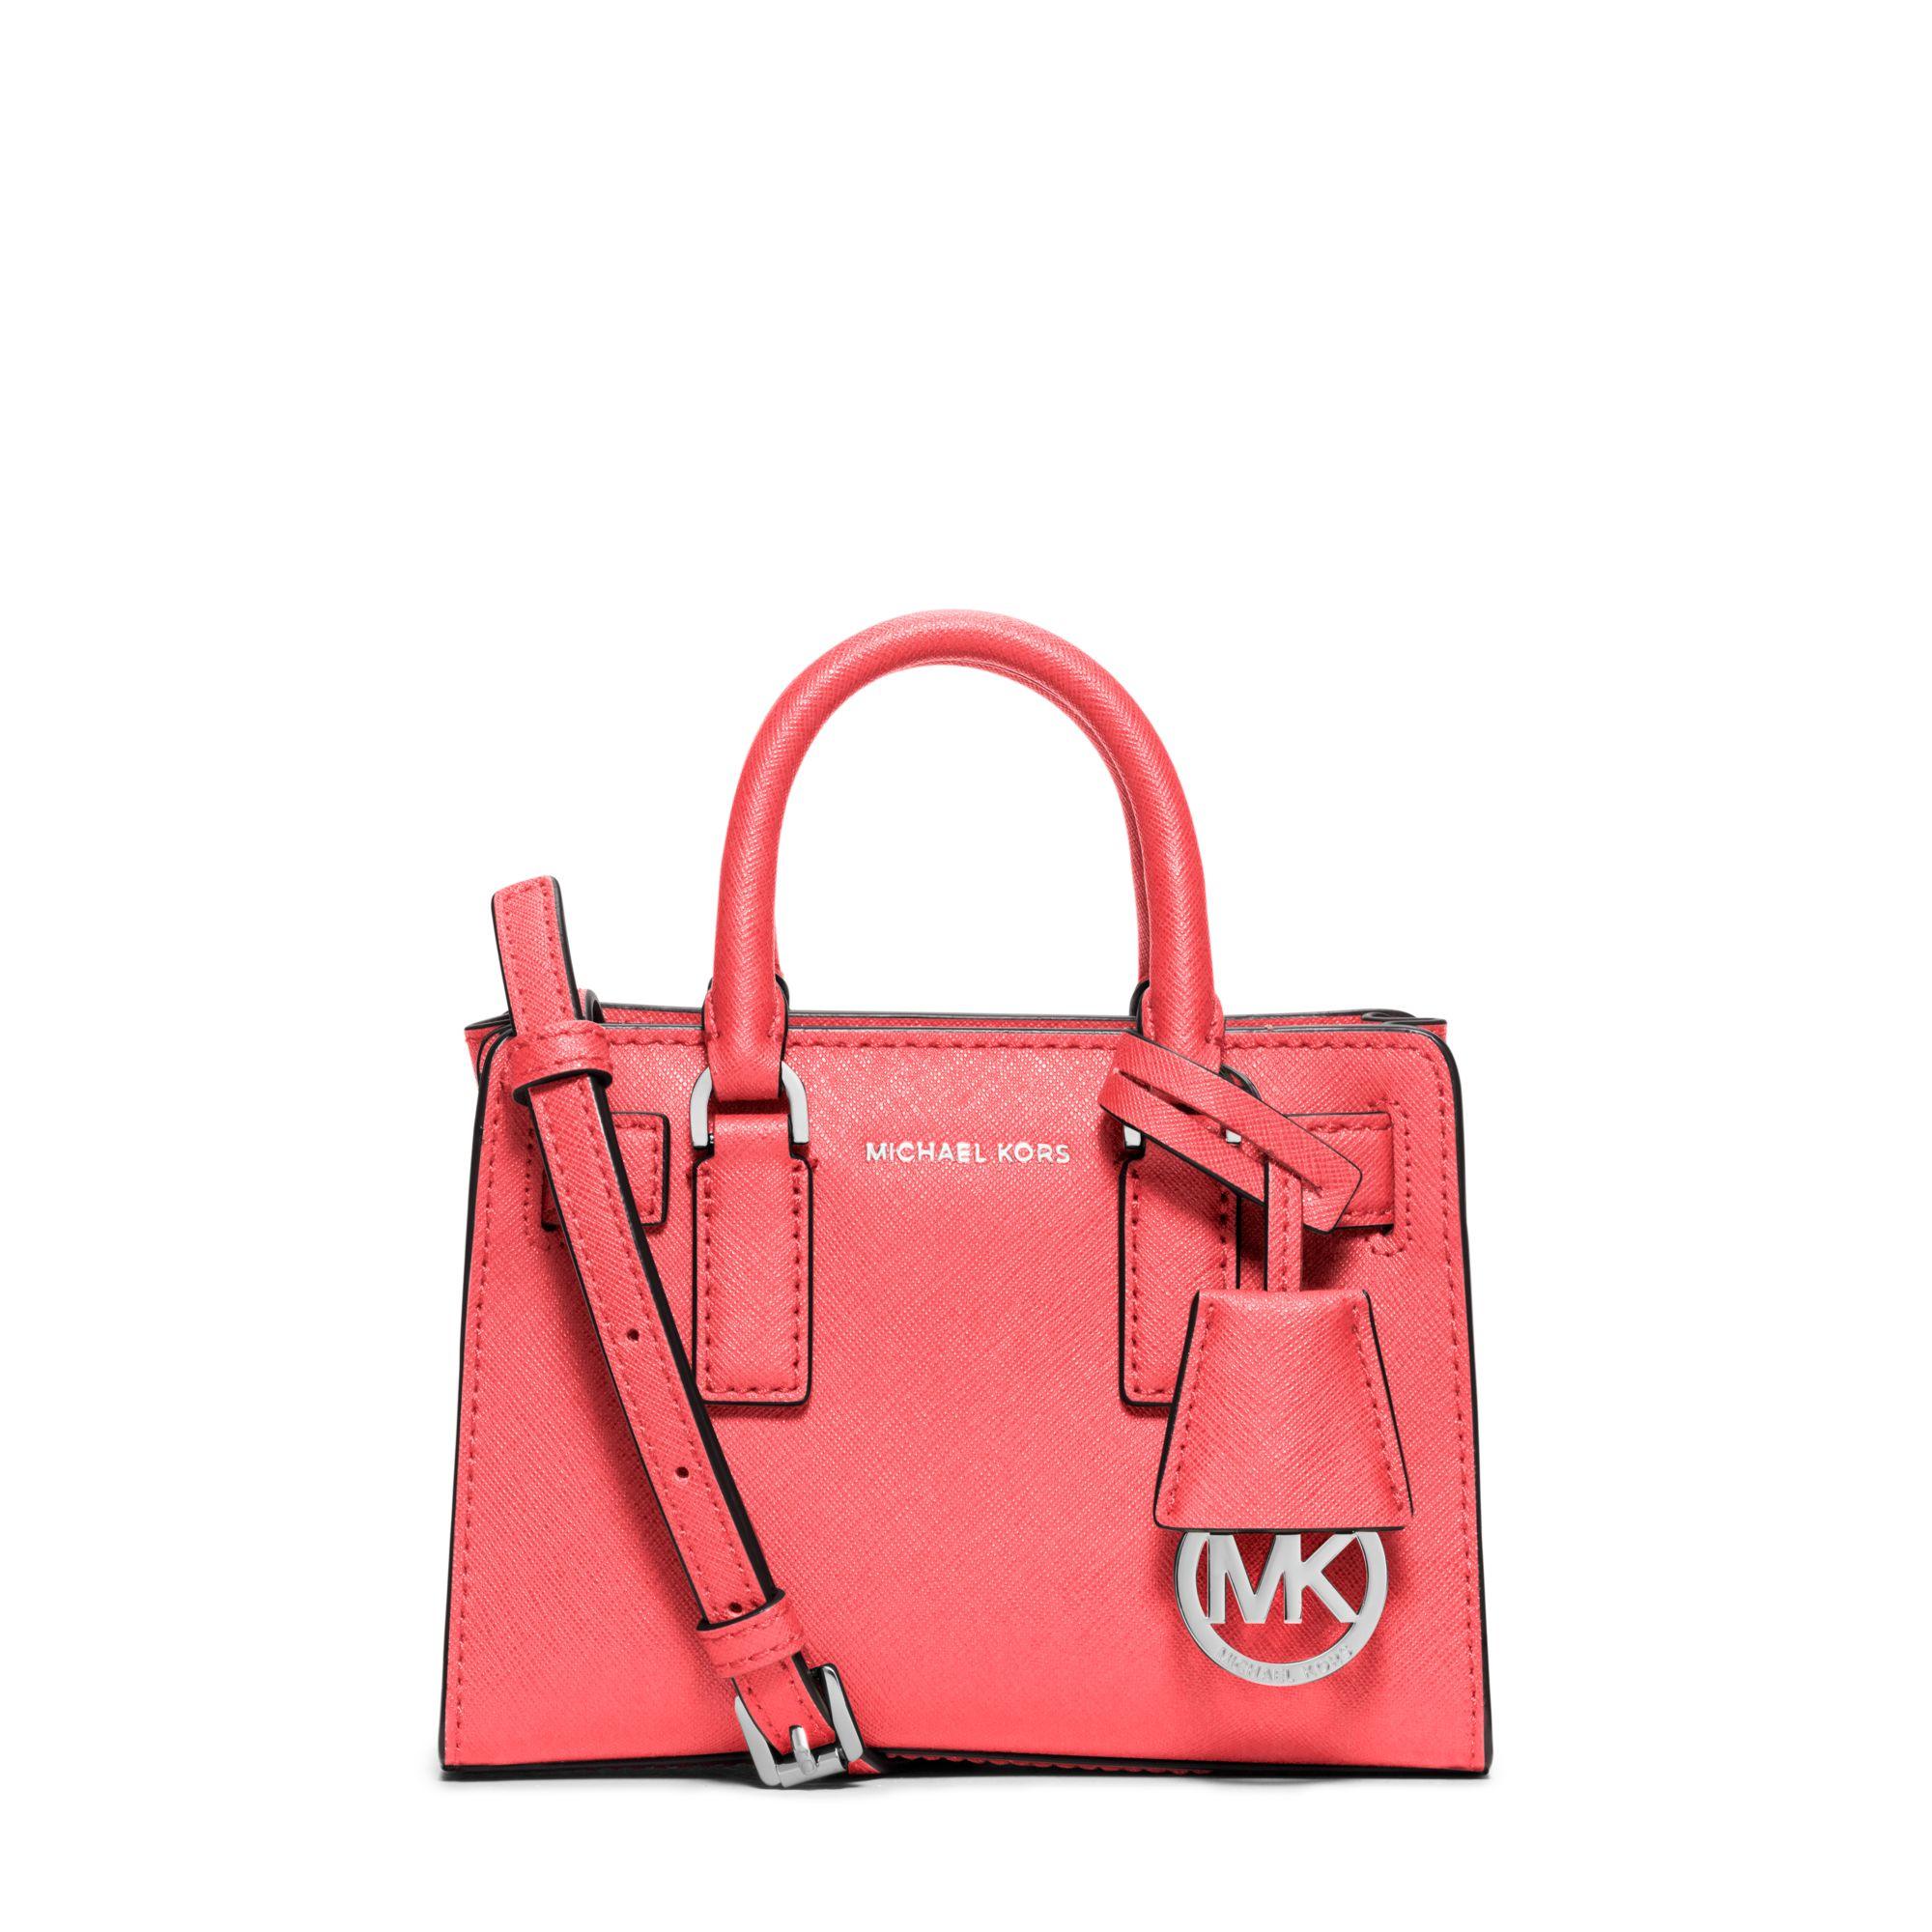 c27fa4cddf1f Michael Kors Dillon Extra-small Saffiano Leather Crossbody in Pink ...